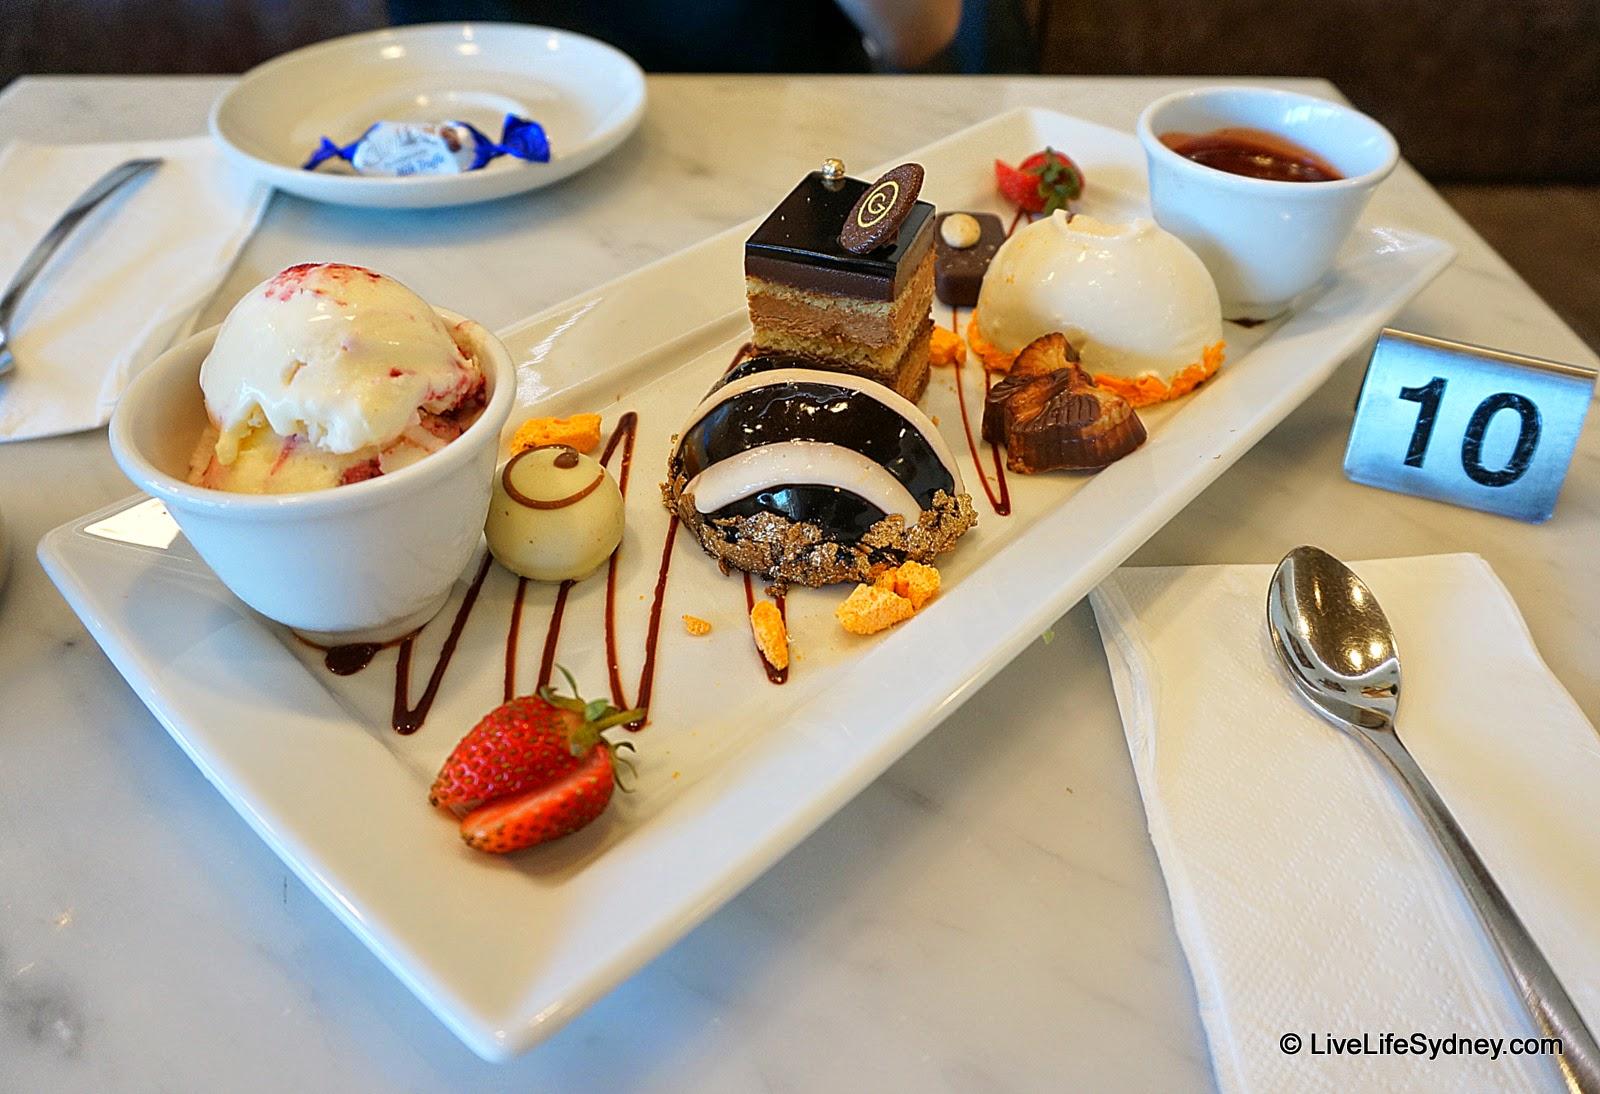 Guylian Cafe Darling Harbour